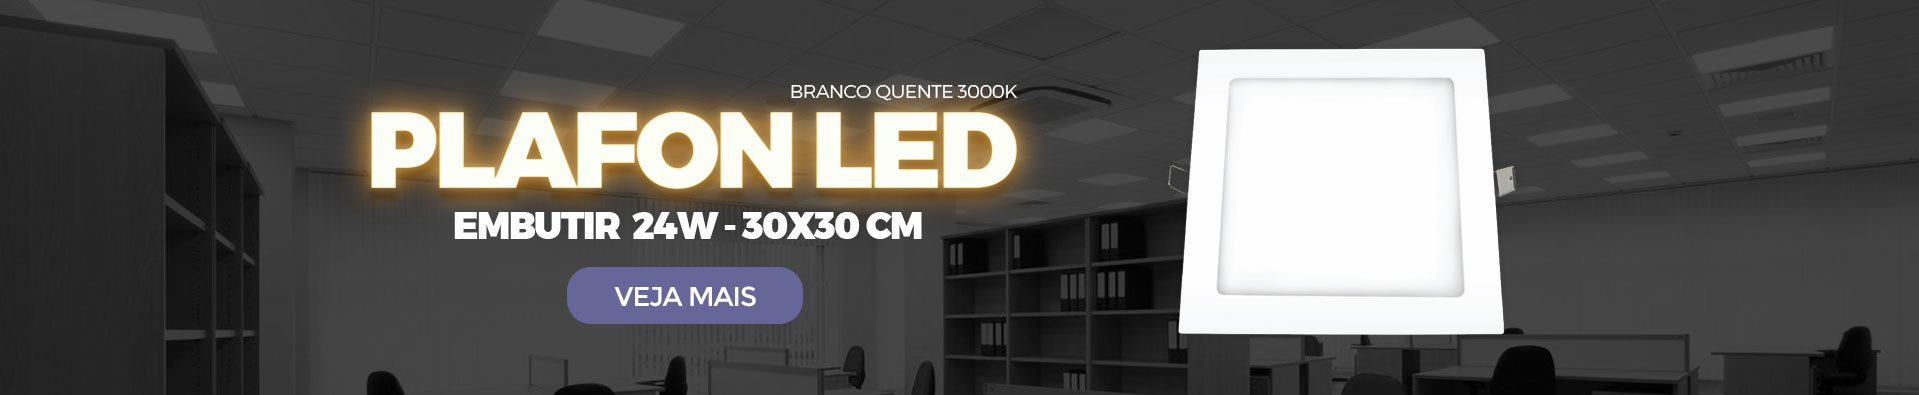 Plafon LED embutir